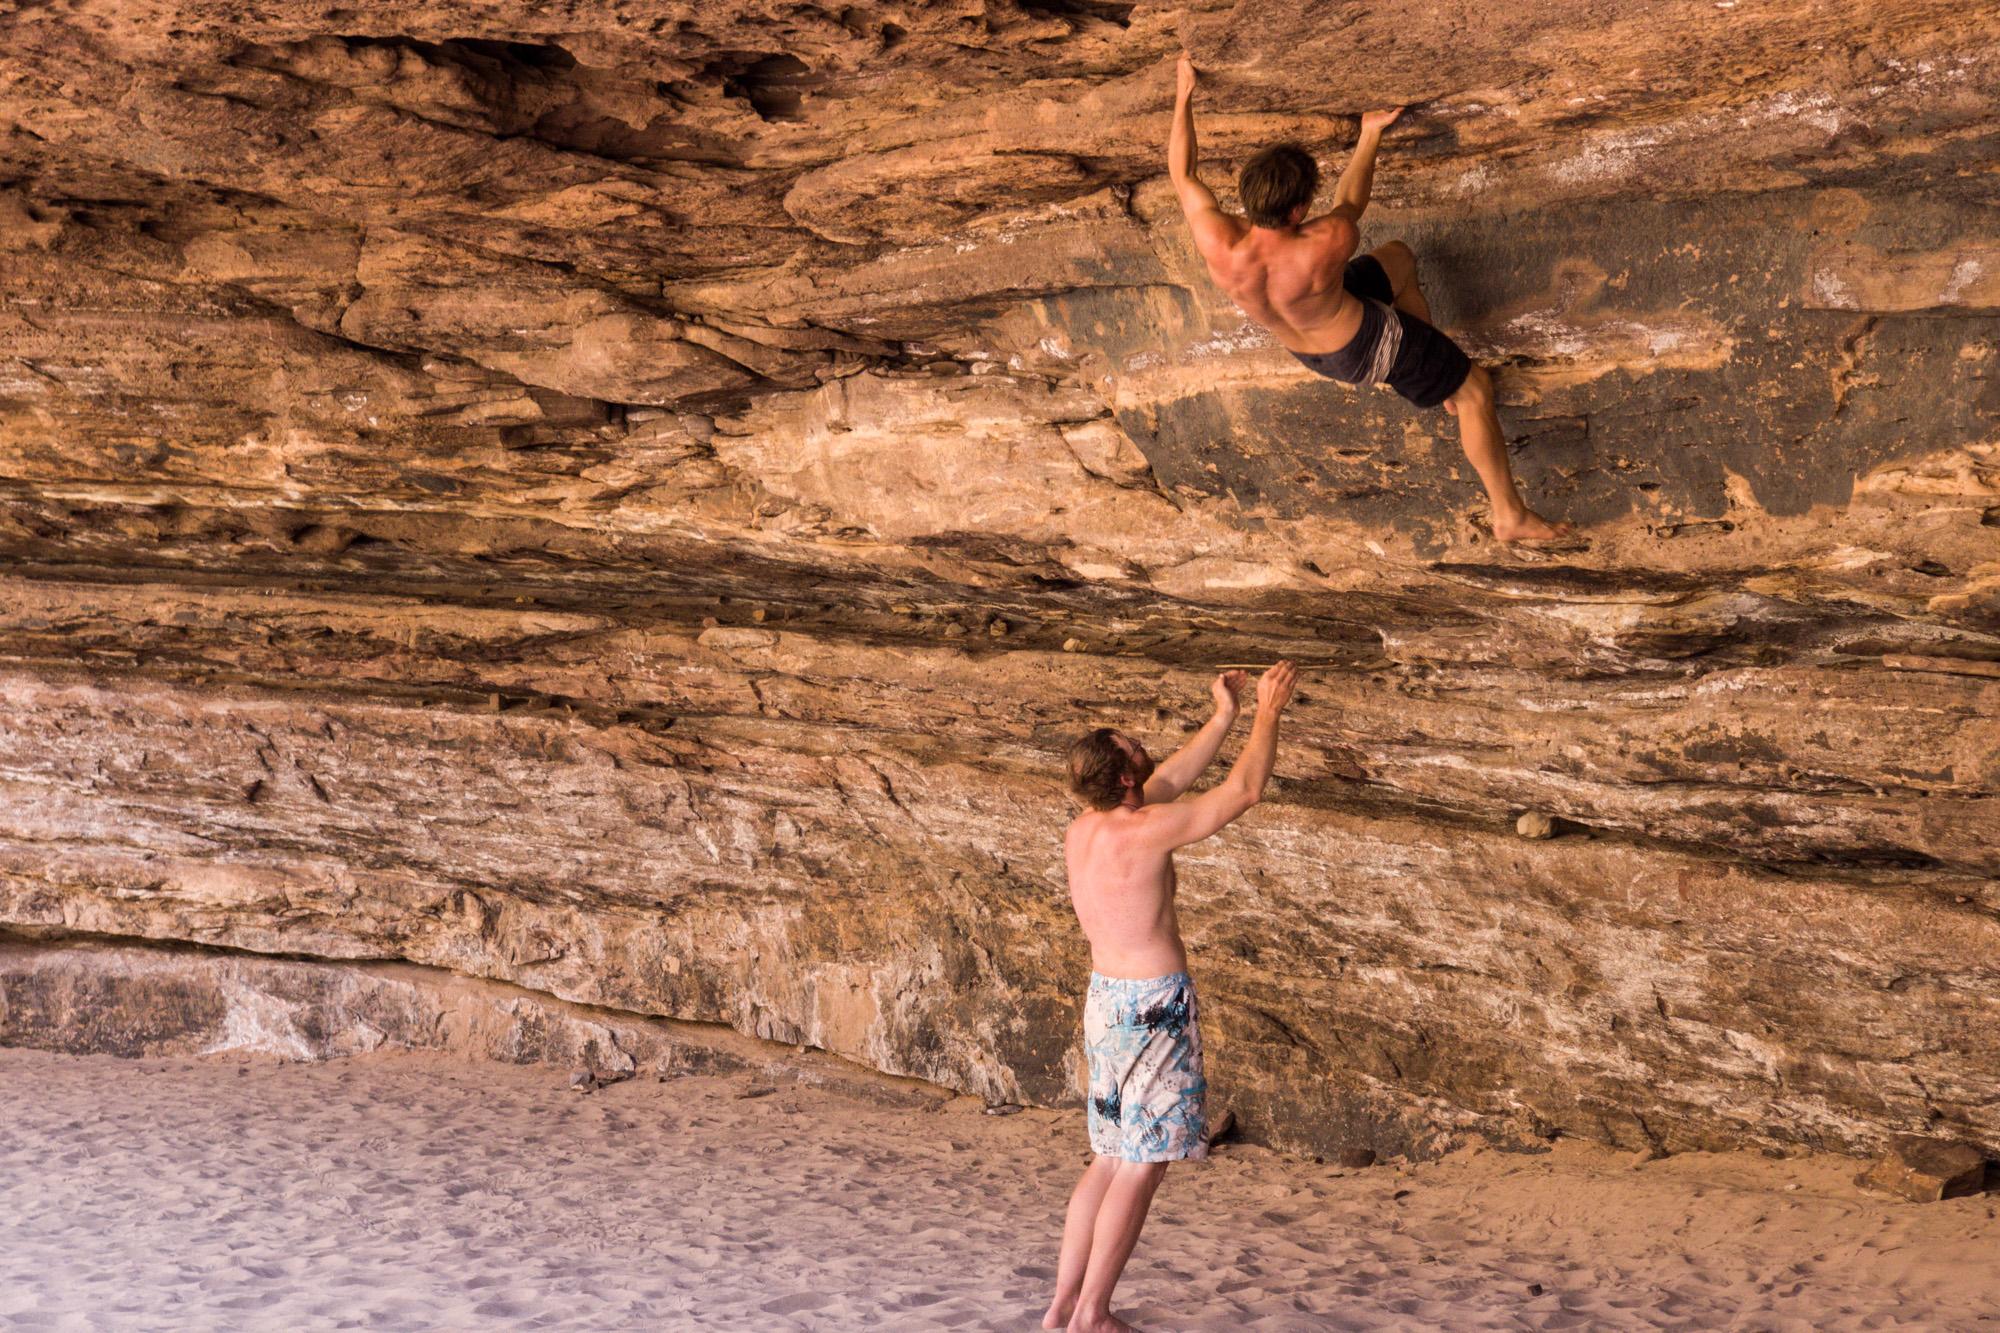 Rock climbing inside the Grand Canyon